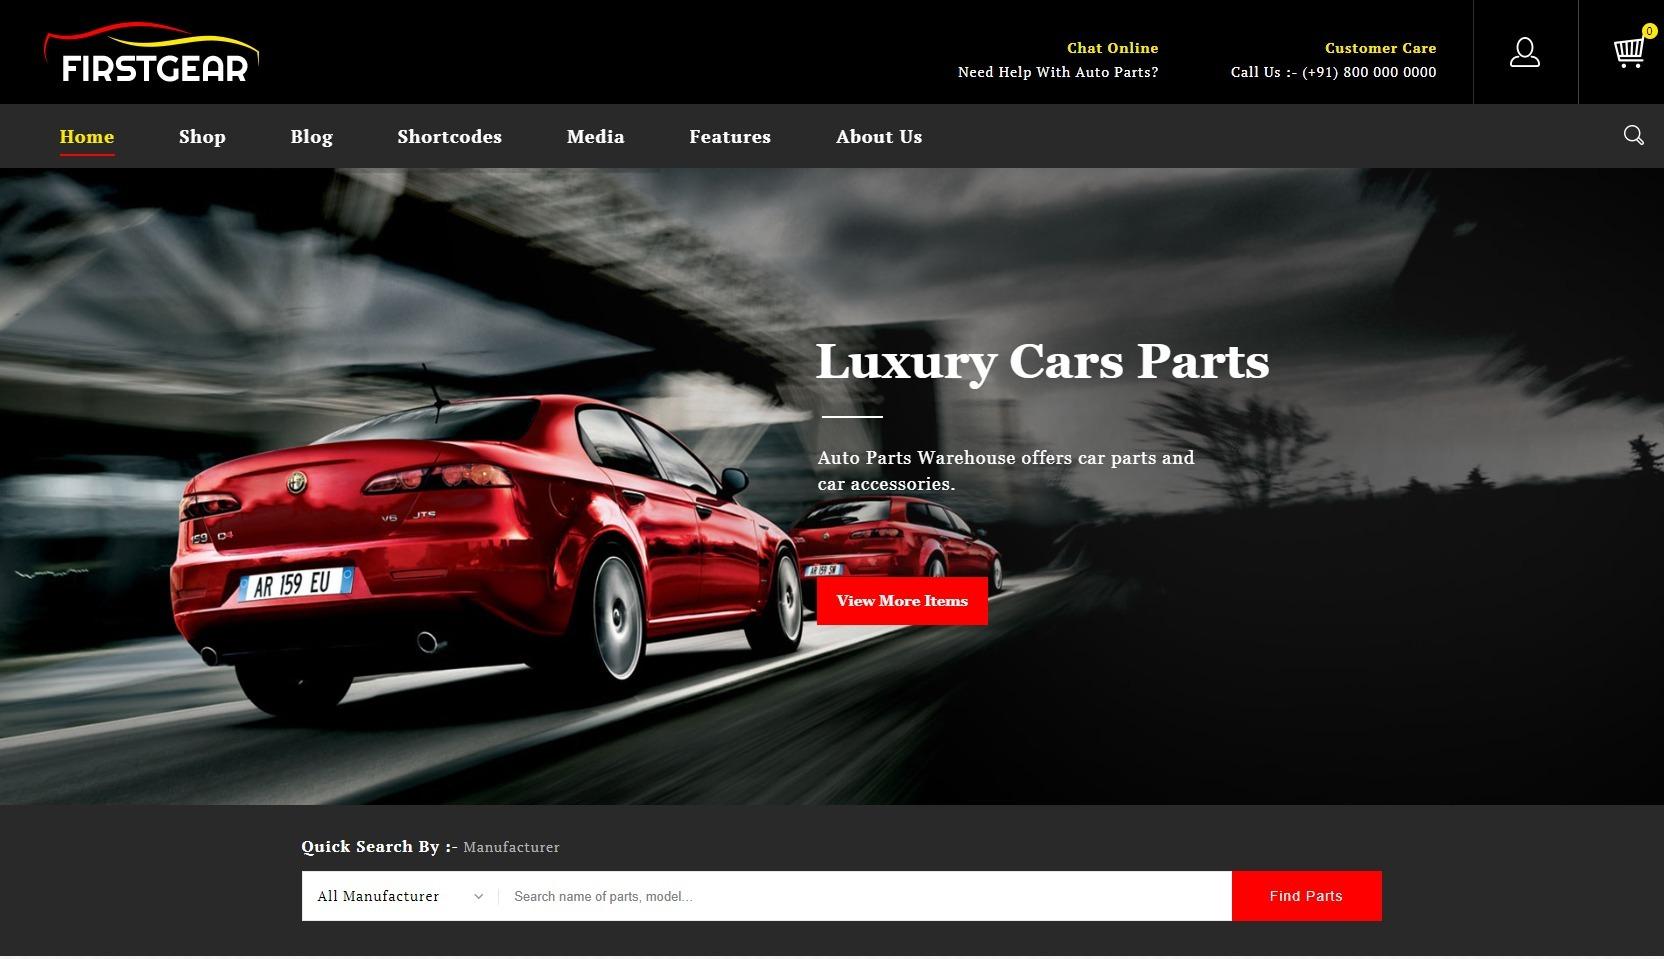 FirstGear WordPress Theme for Auto Parts Sales